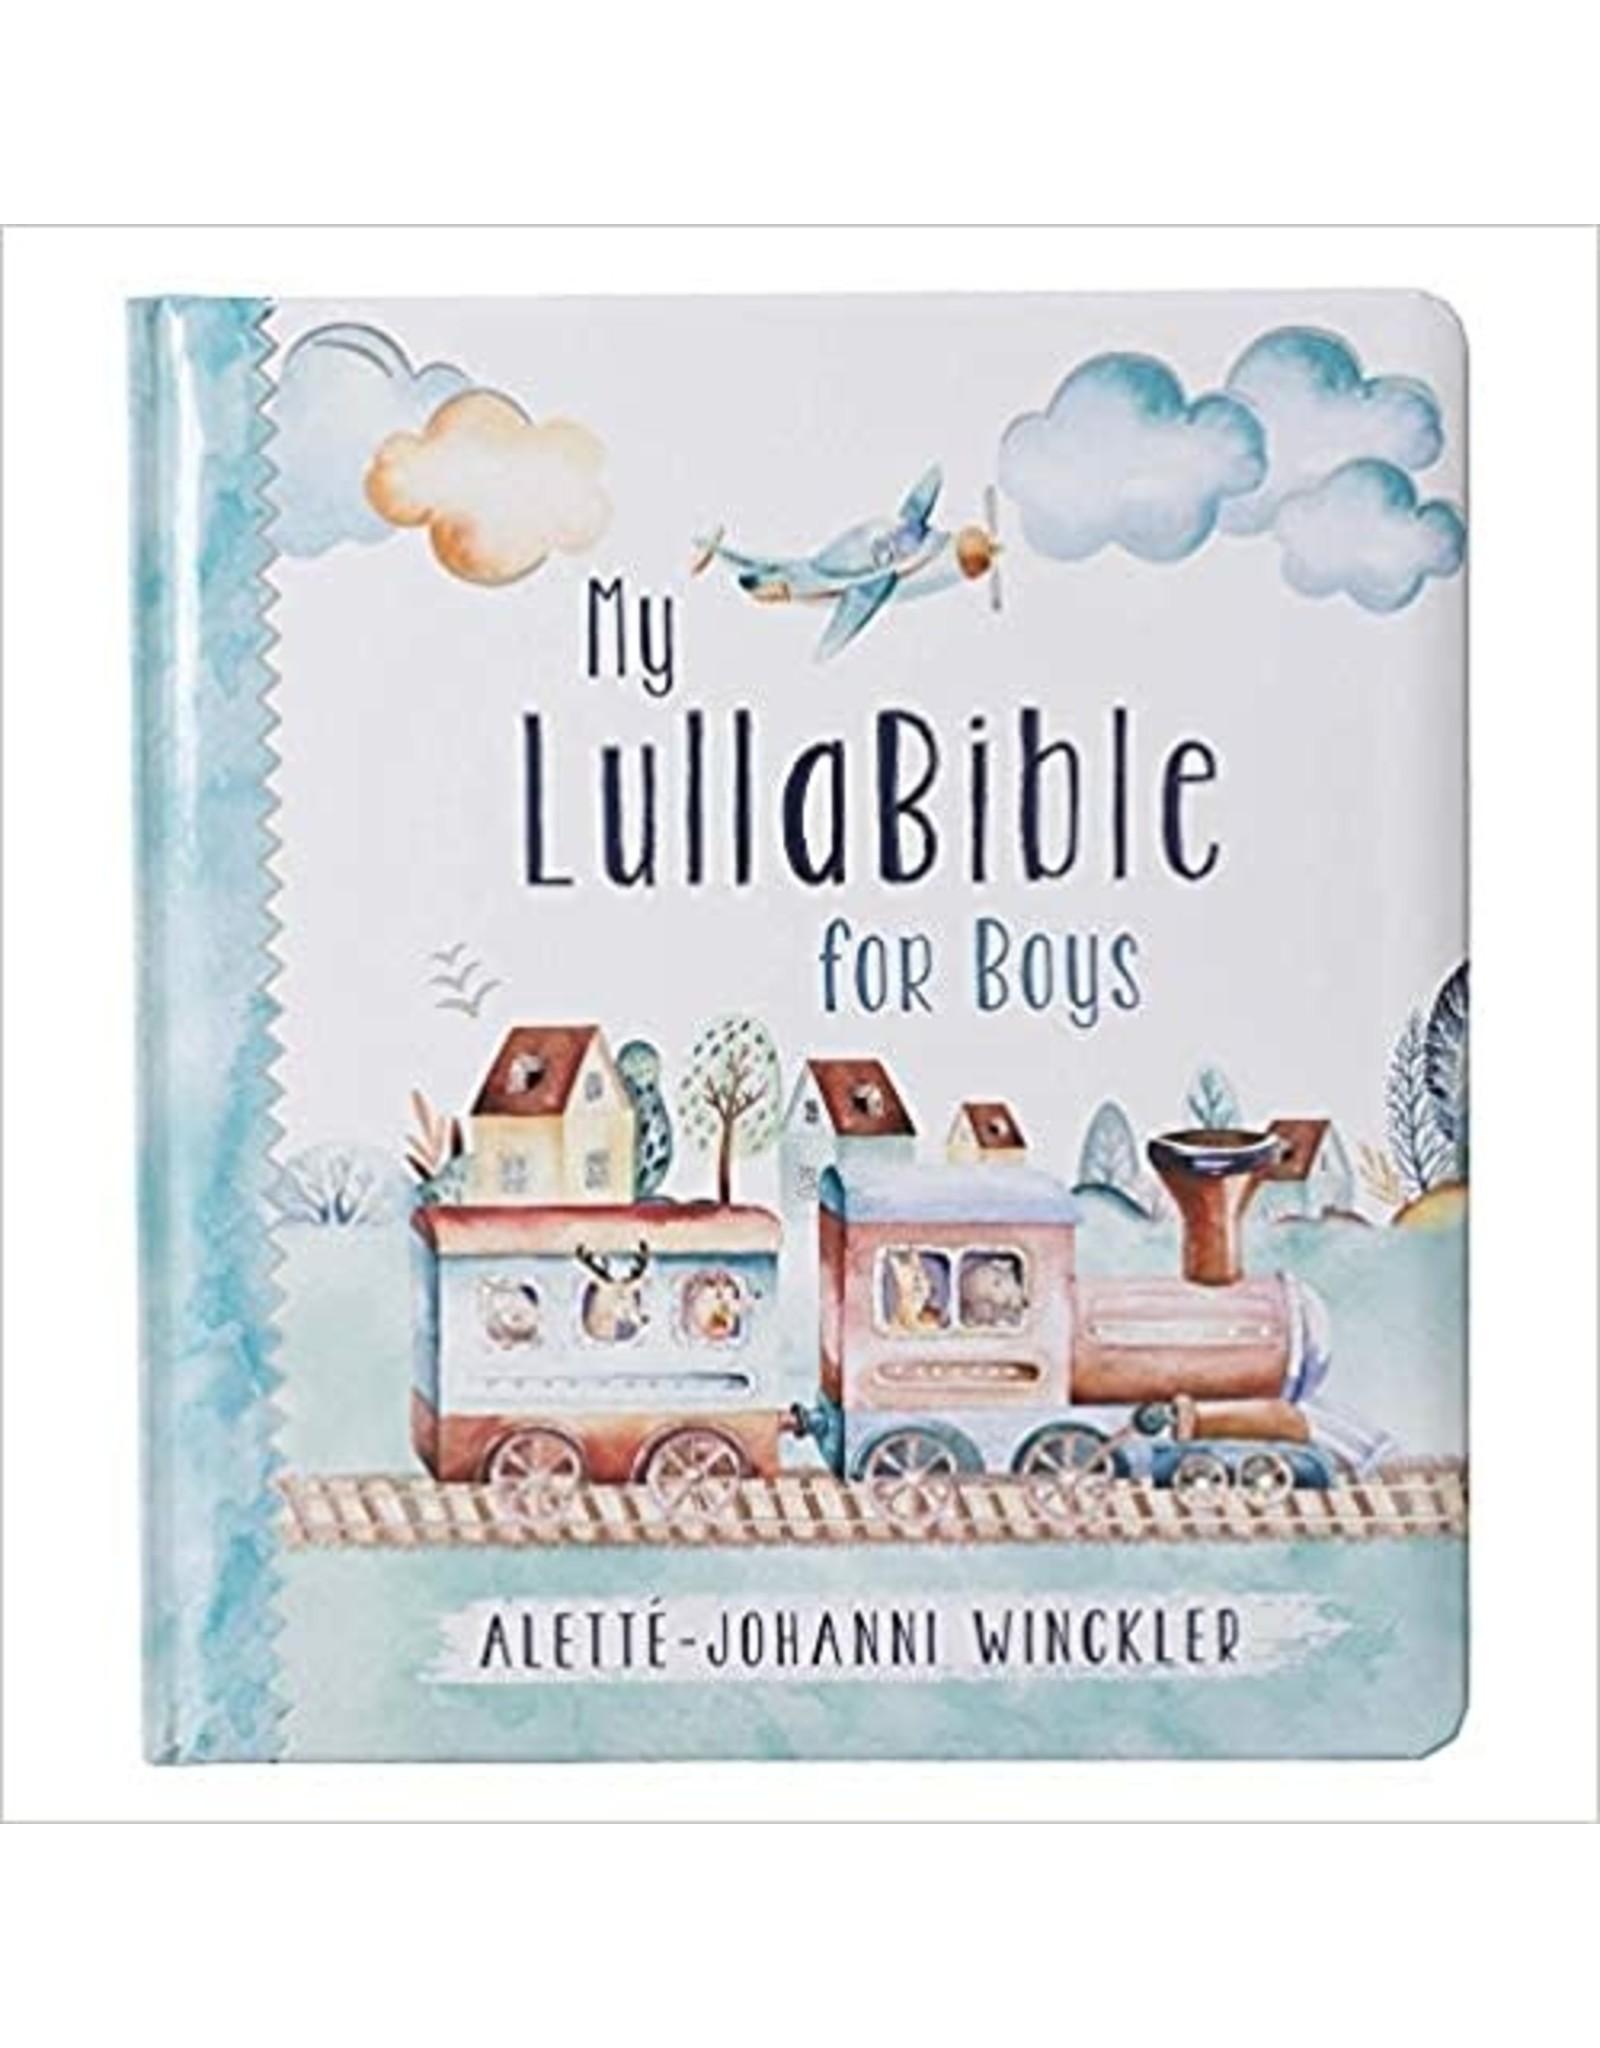 My LullaBible for Boys